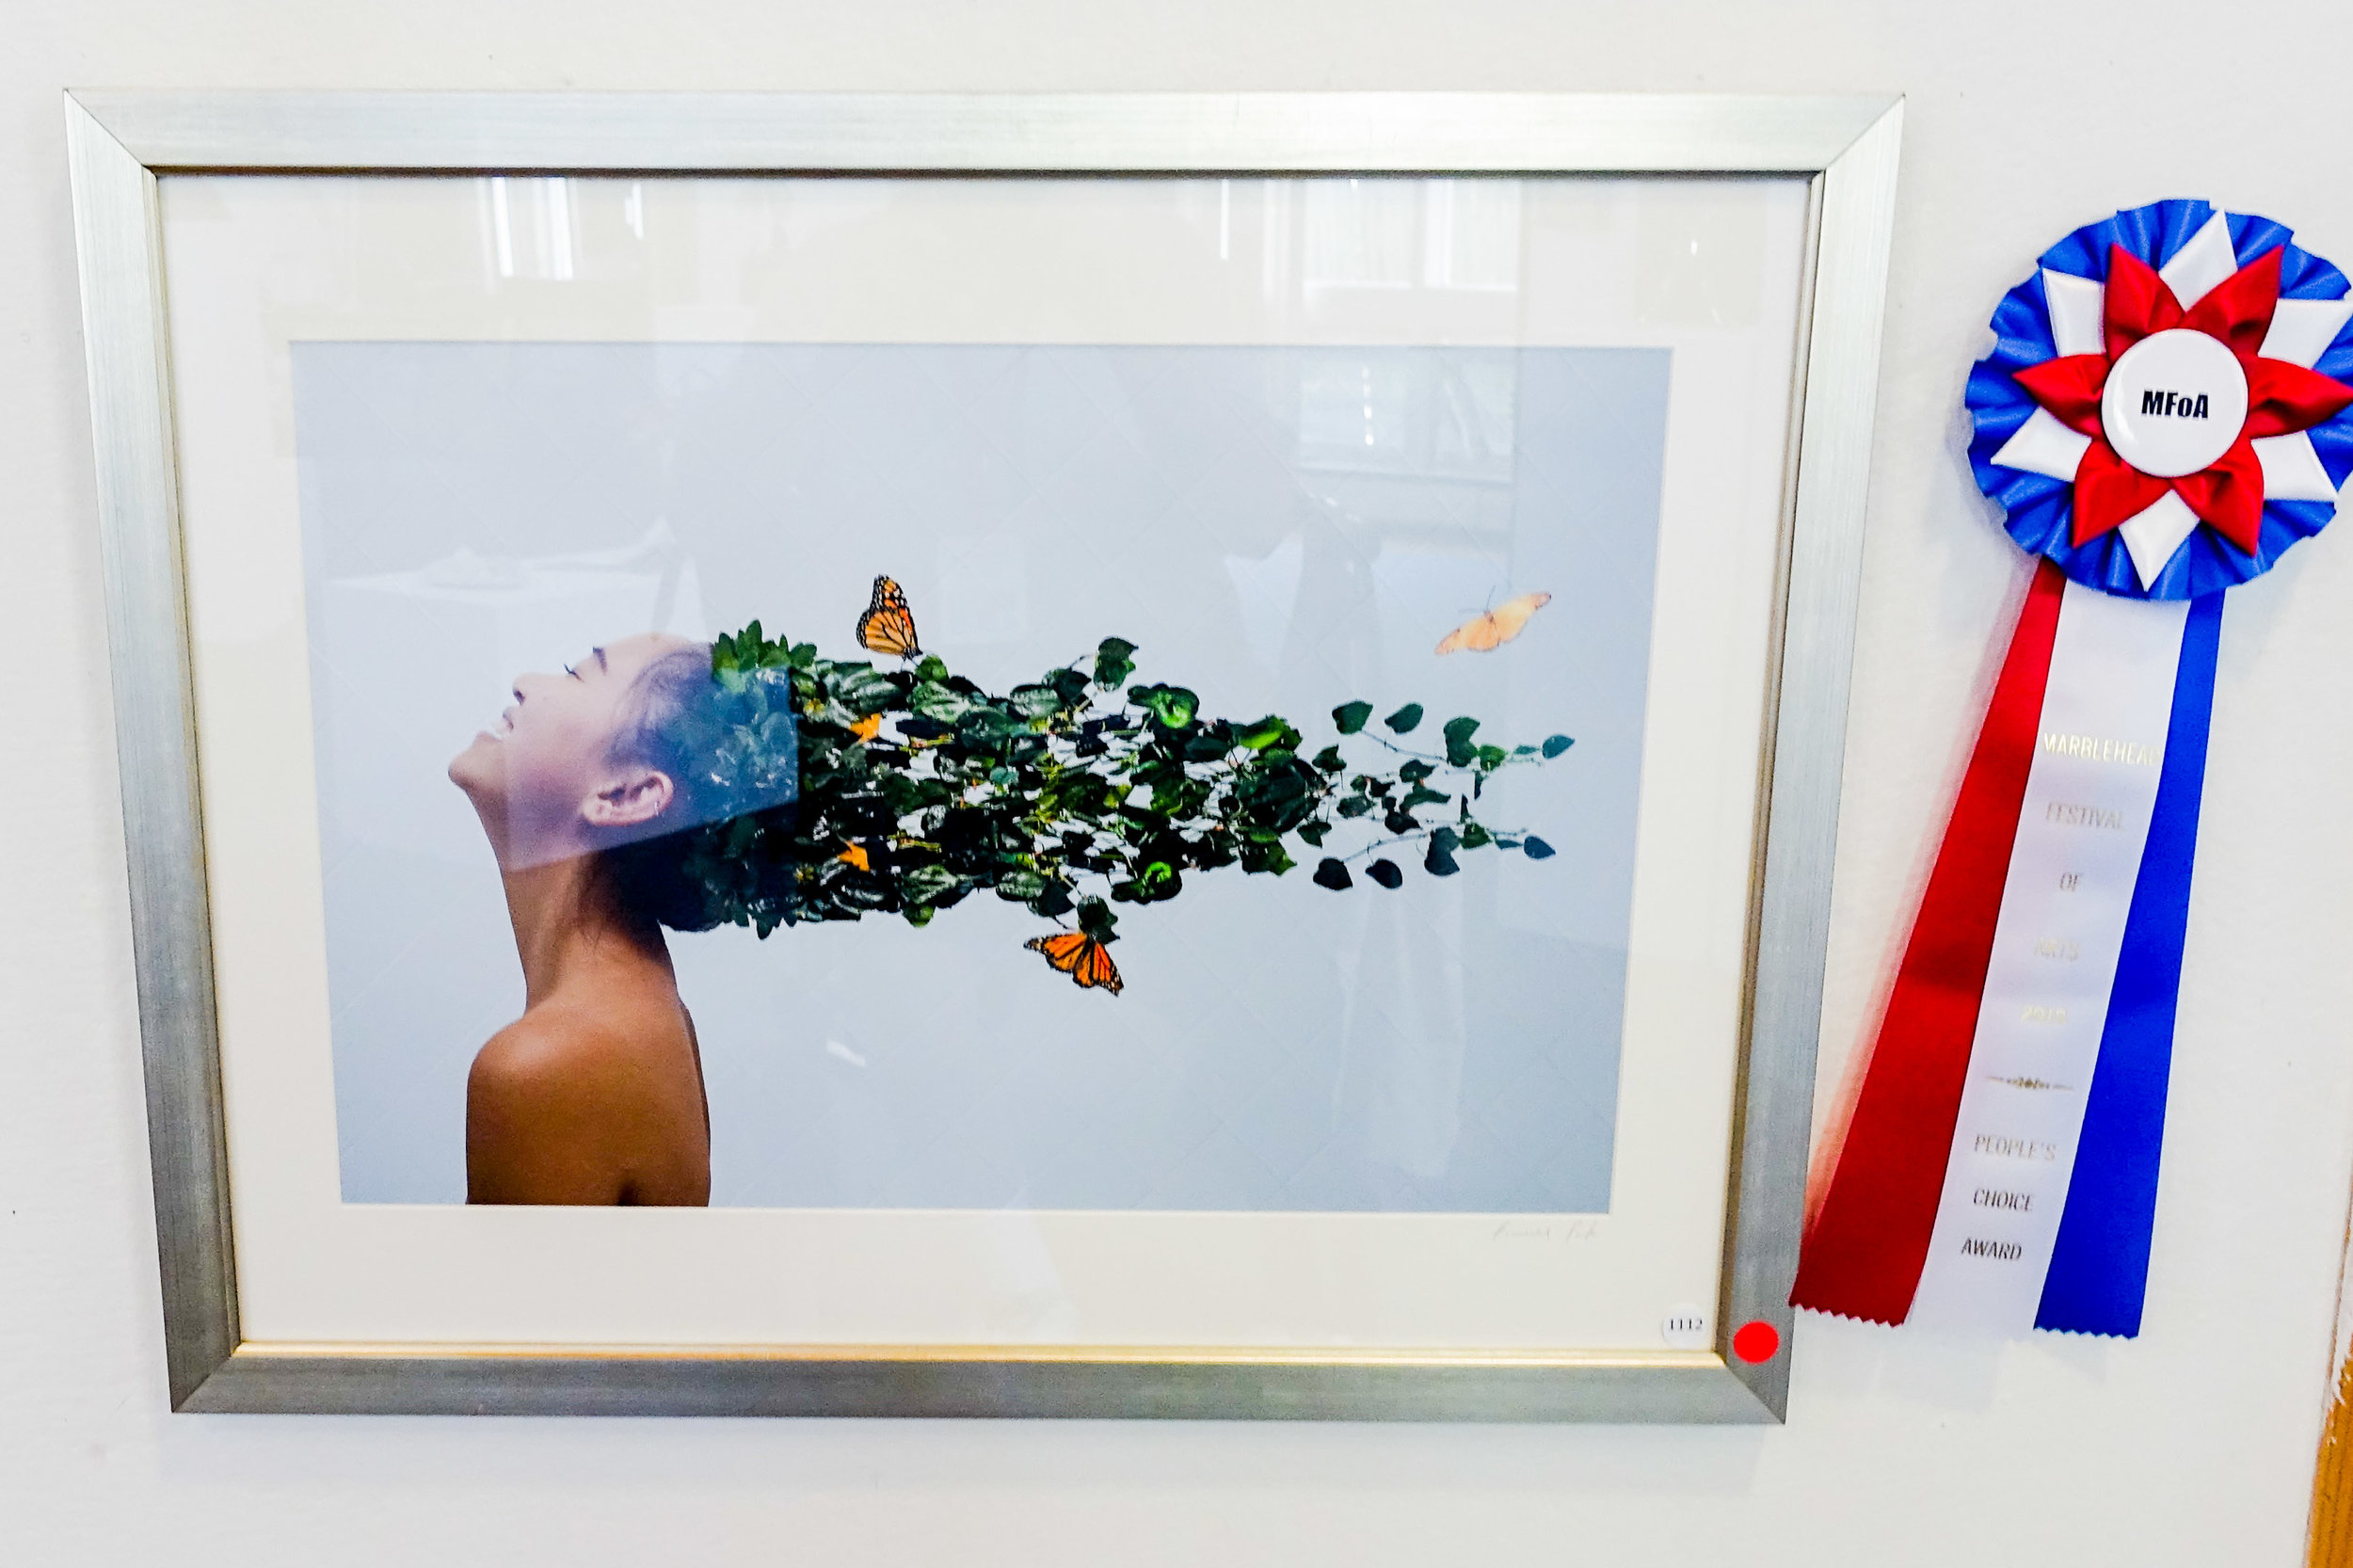 Digital Art, Frances Paik